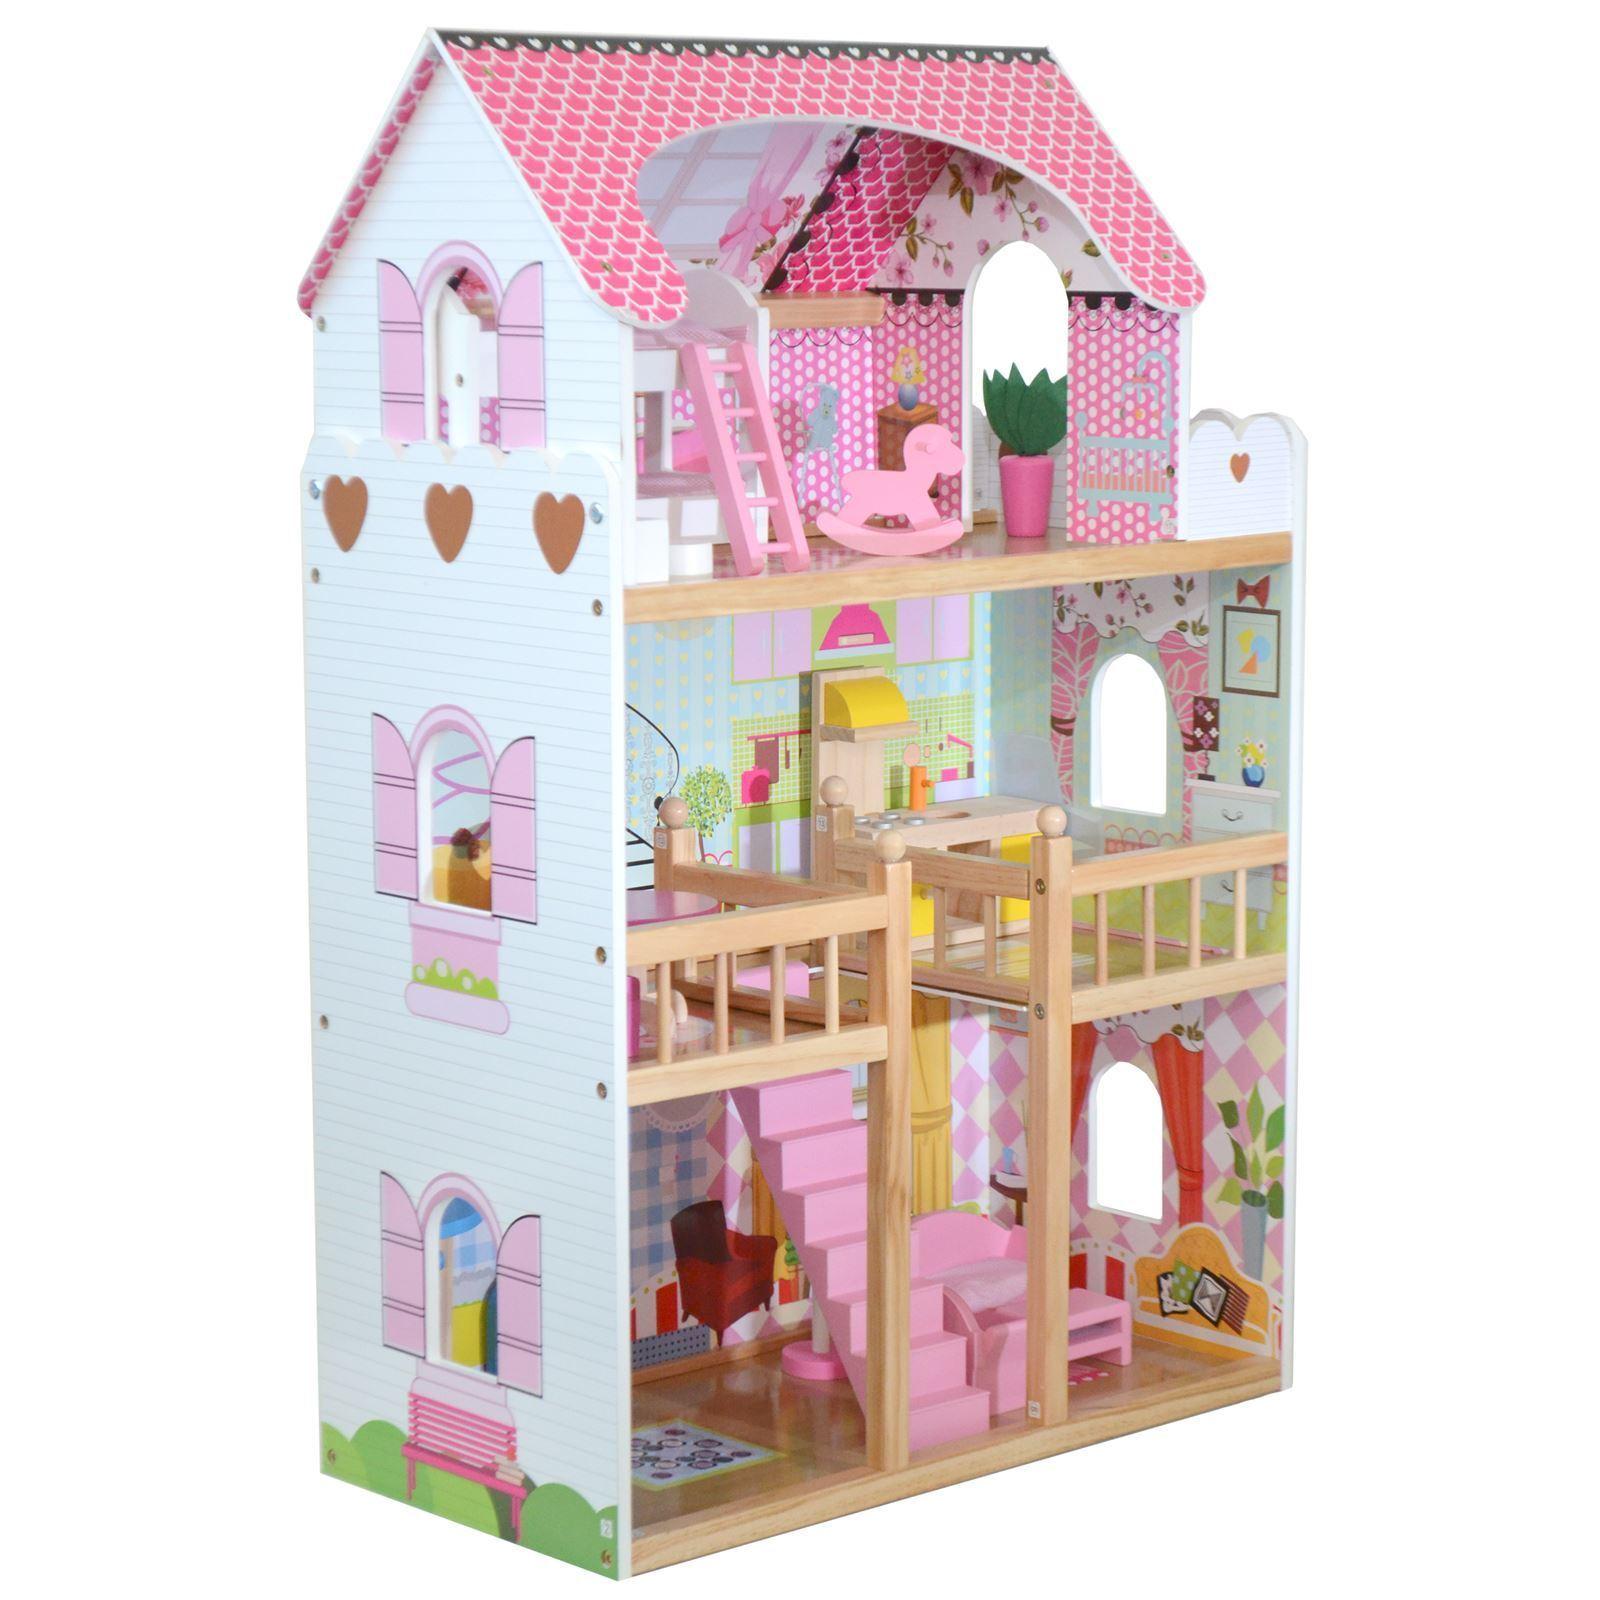 Boppi® Toy Wooden Girls Dolls House 3 Storey Town Mansion+ Furniture Accessories